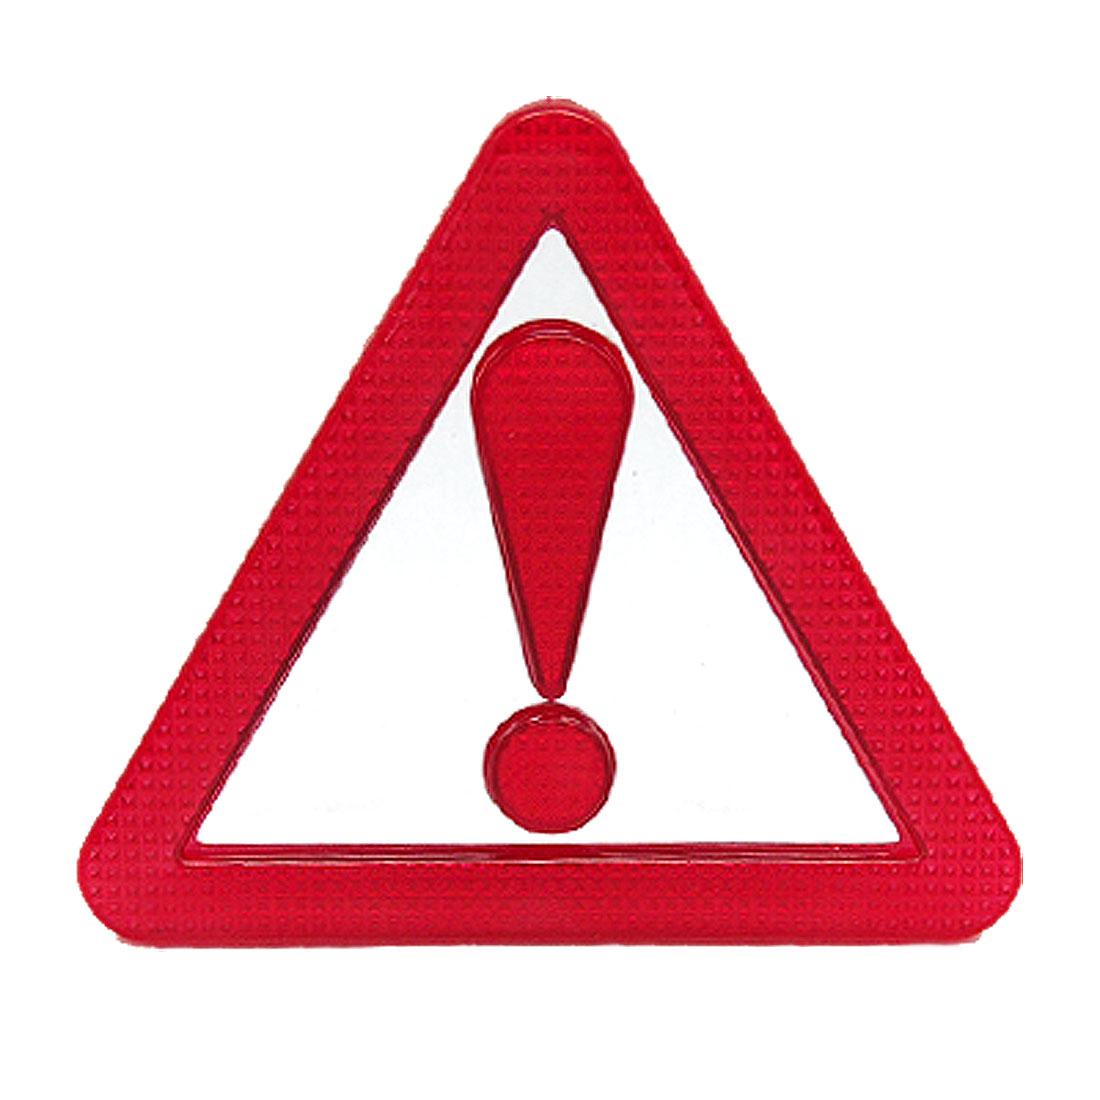 Warning Sign Danger Sign Plate for Car